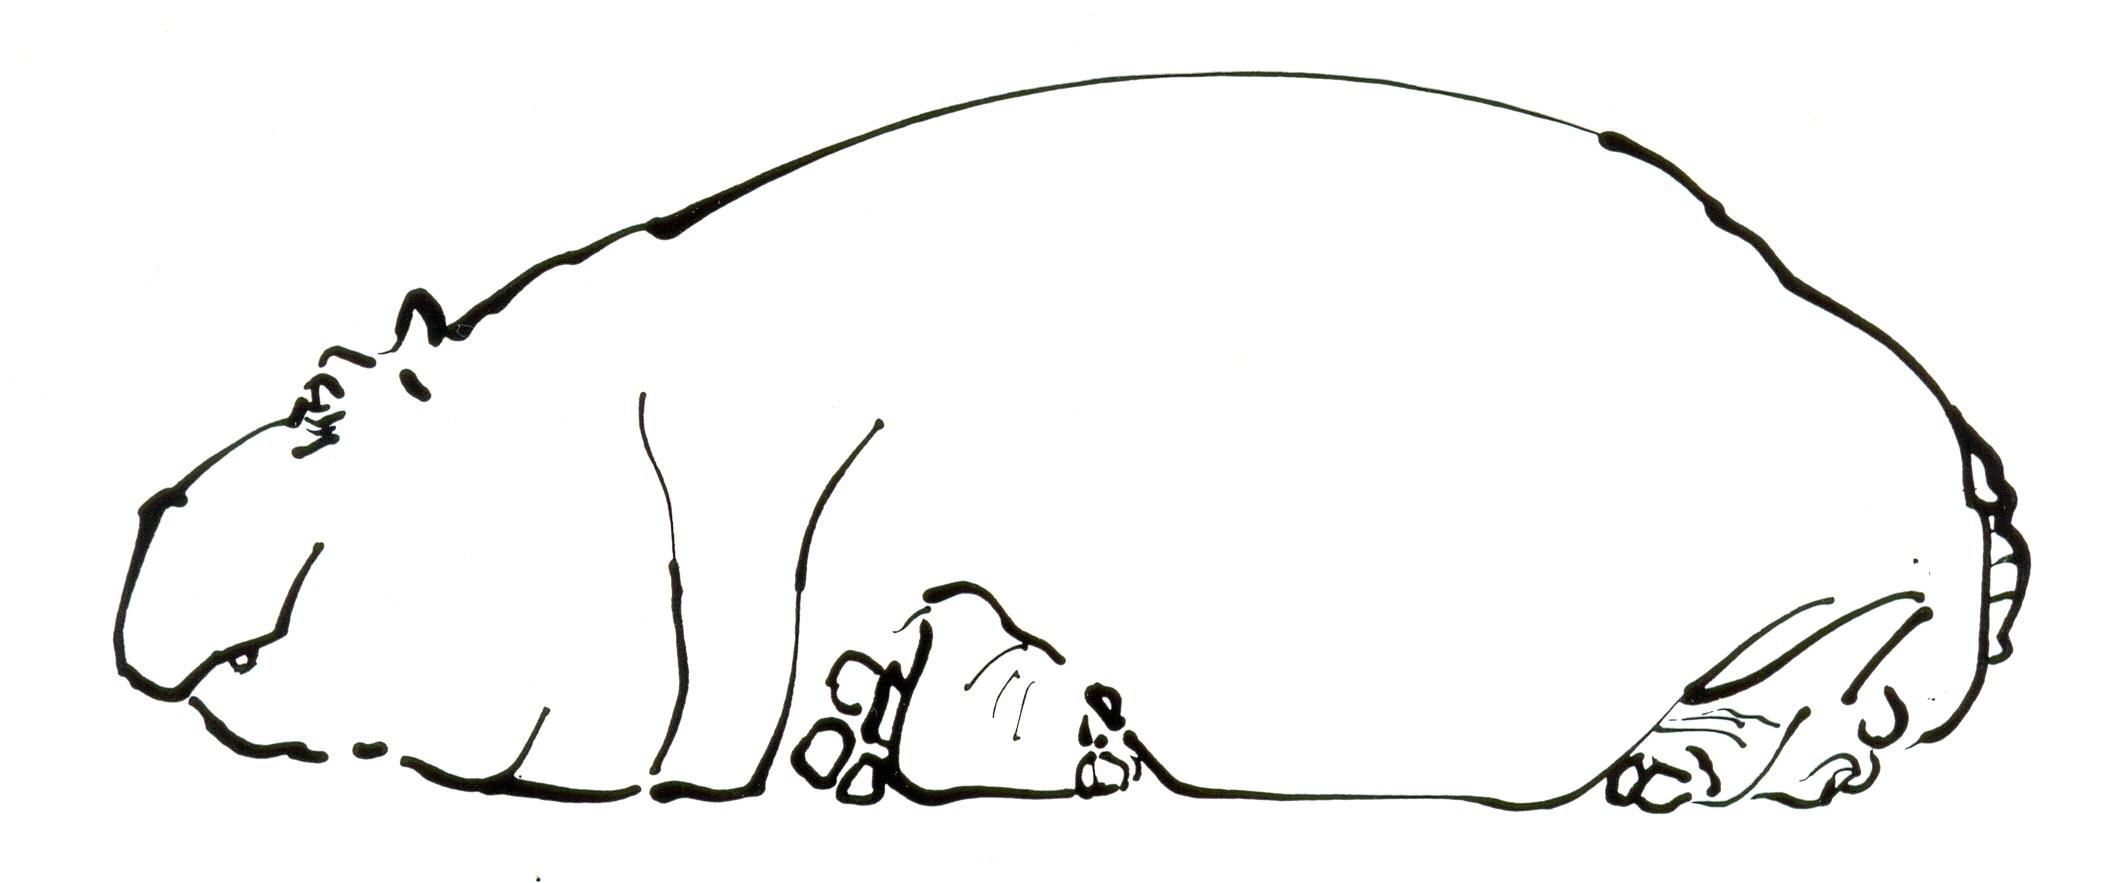 Ink Gesture Drawing by Britt Zaist.HIPPO.jpg